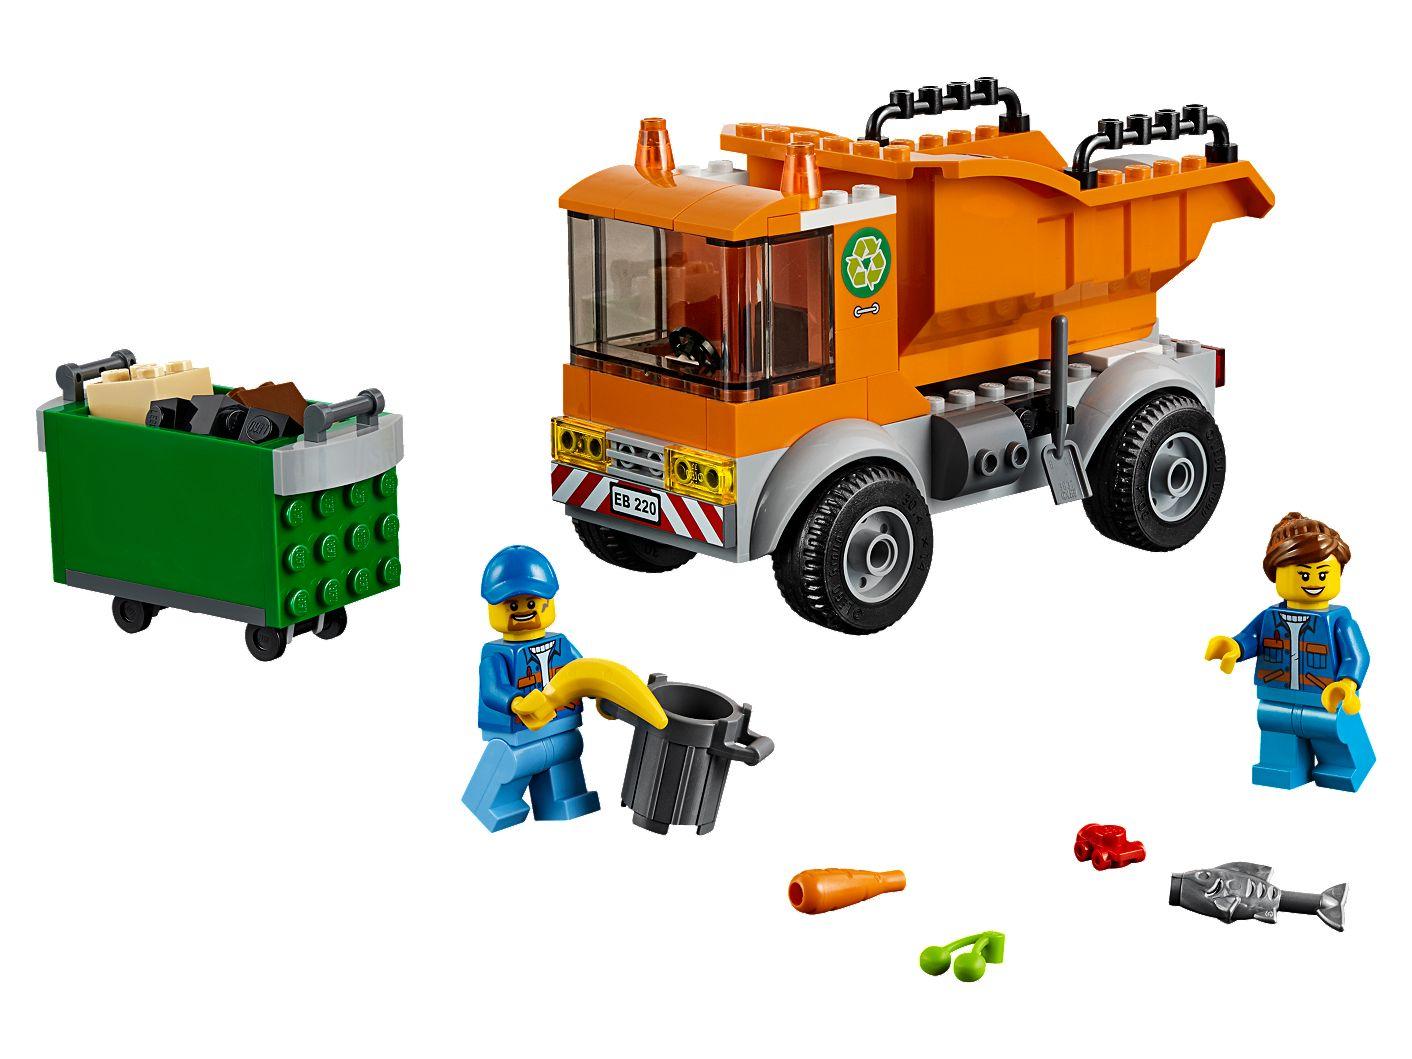 Garbage Truck 60220 City Lego Shop